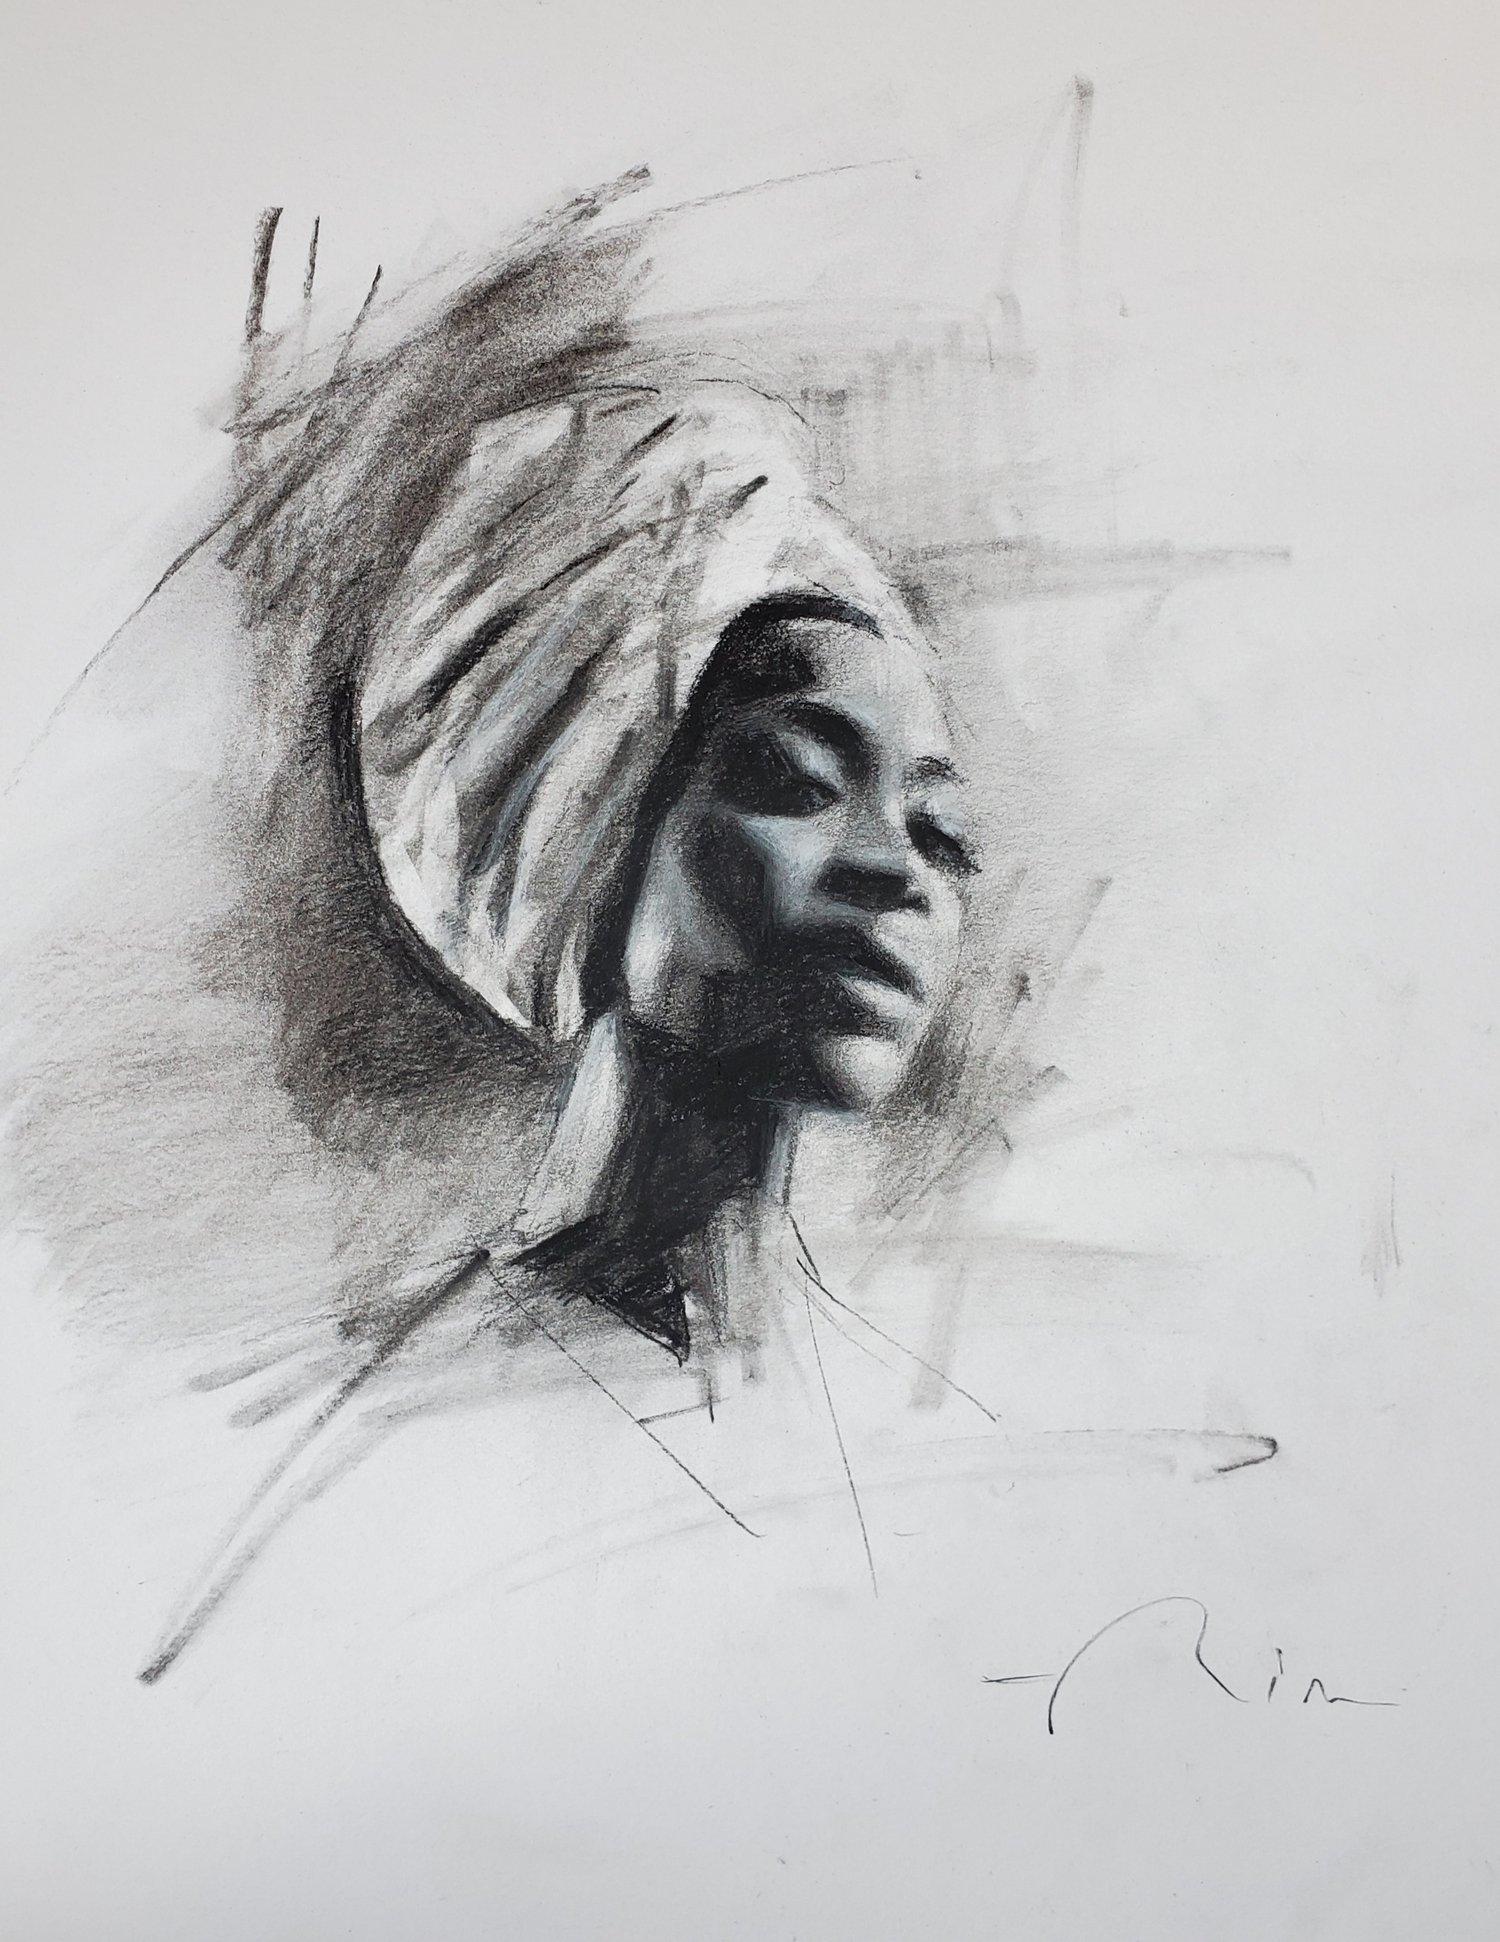 Image of ORIGINAL Eryka Badu